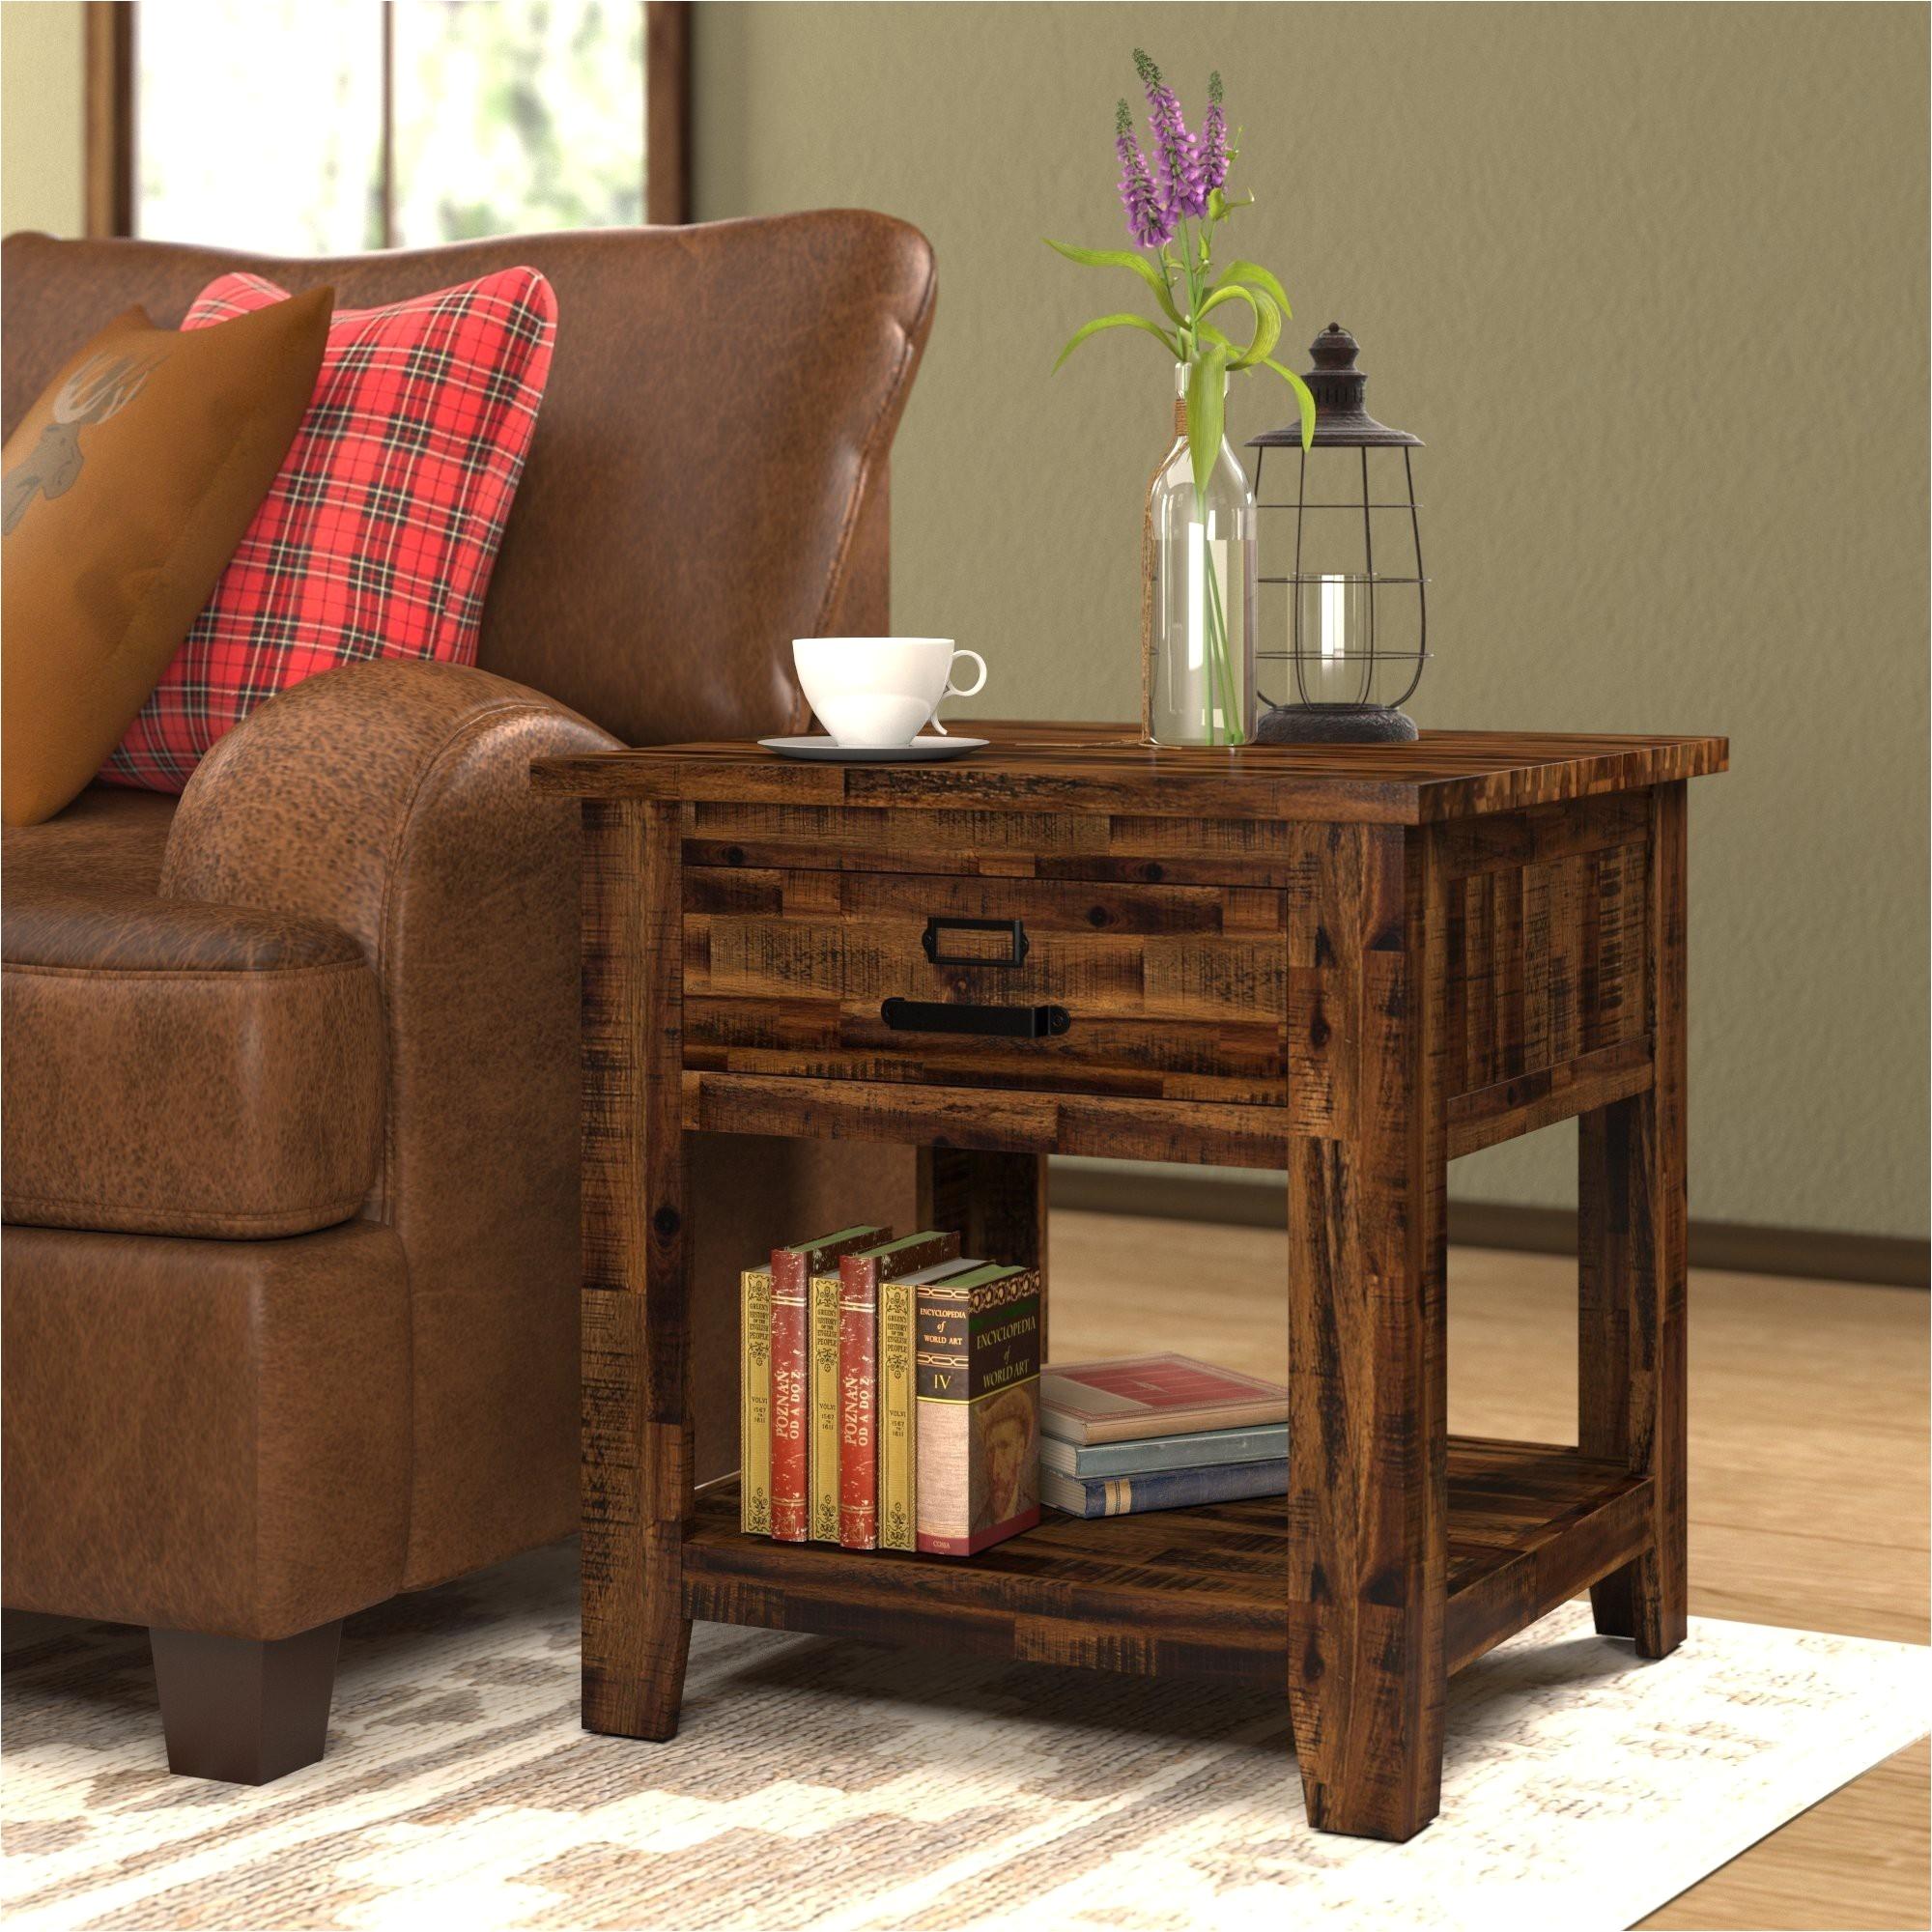 Wood Side Tables Living Room Inspiring Narrow Side Tables for Living Room Best Traditional Wood